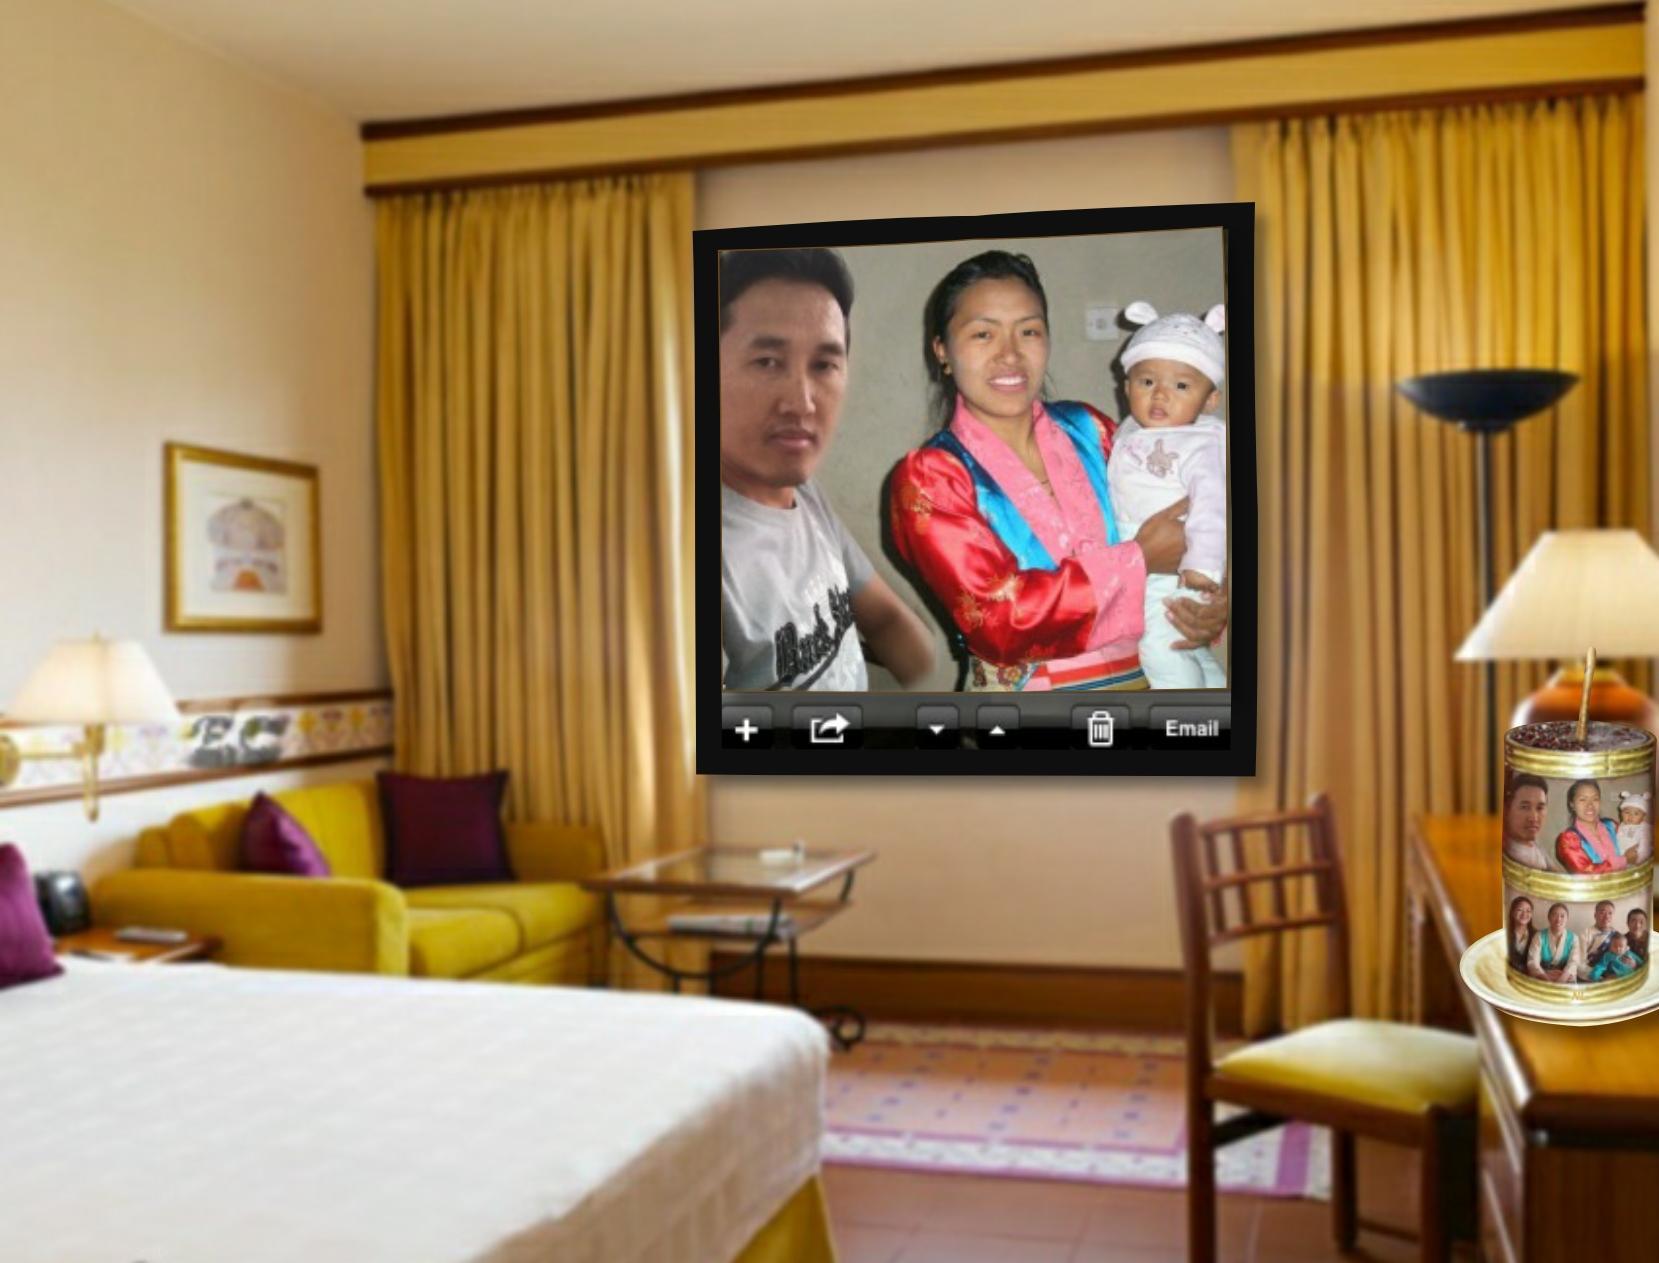 ngima108\'s Picture Frames - 2011 June - Nepali Bedroom frame. Solu ...